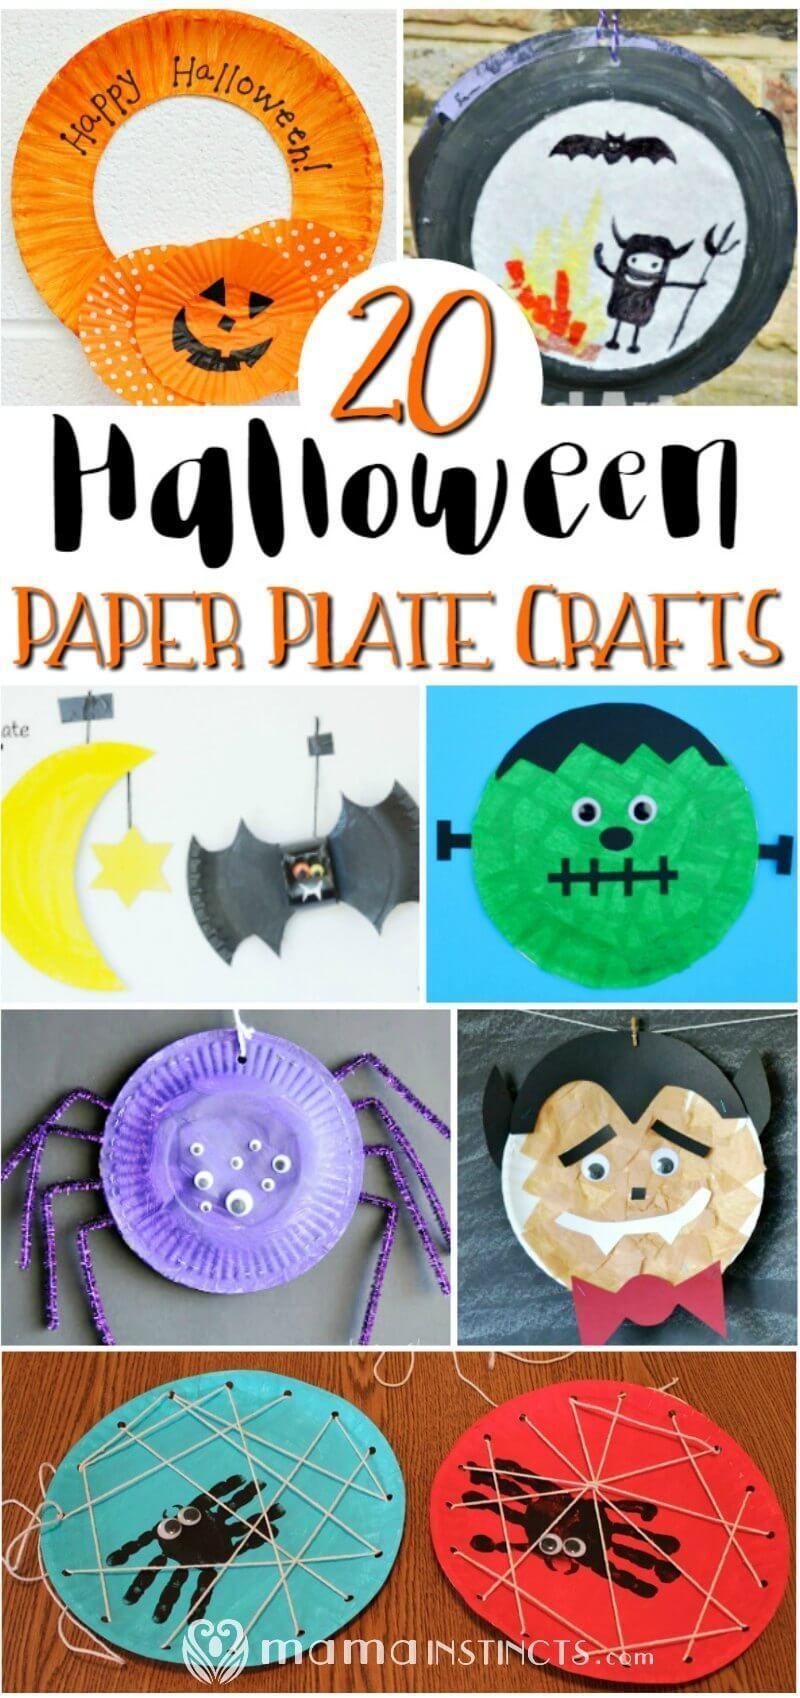 46++ Halloween craft ideas for kindergarten classes ideas